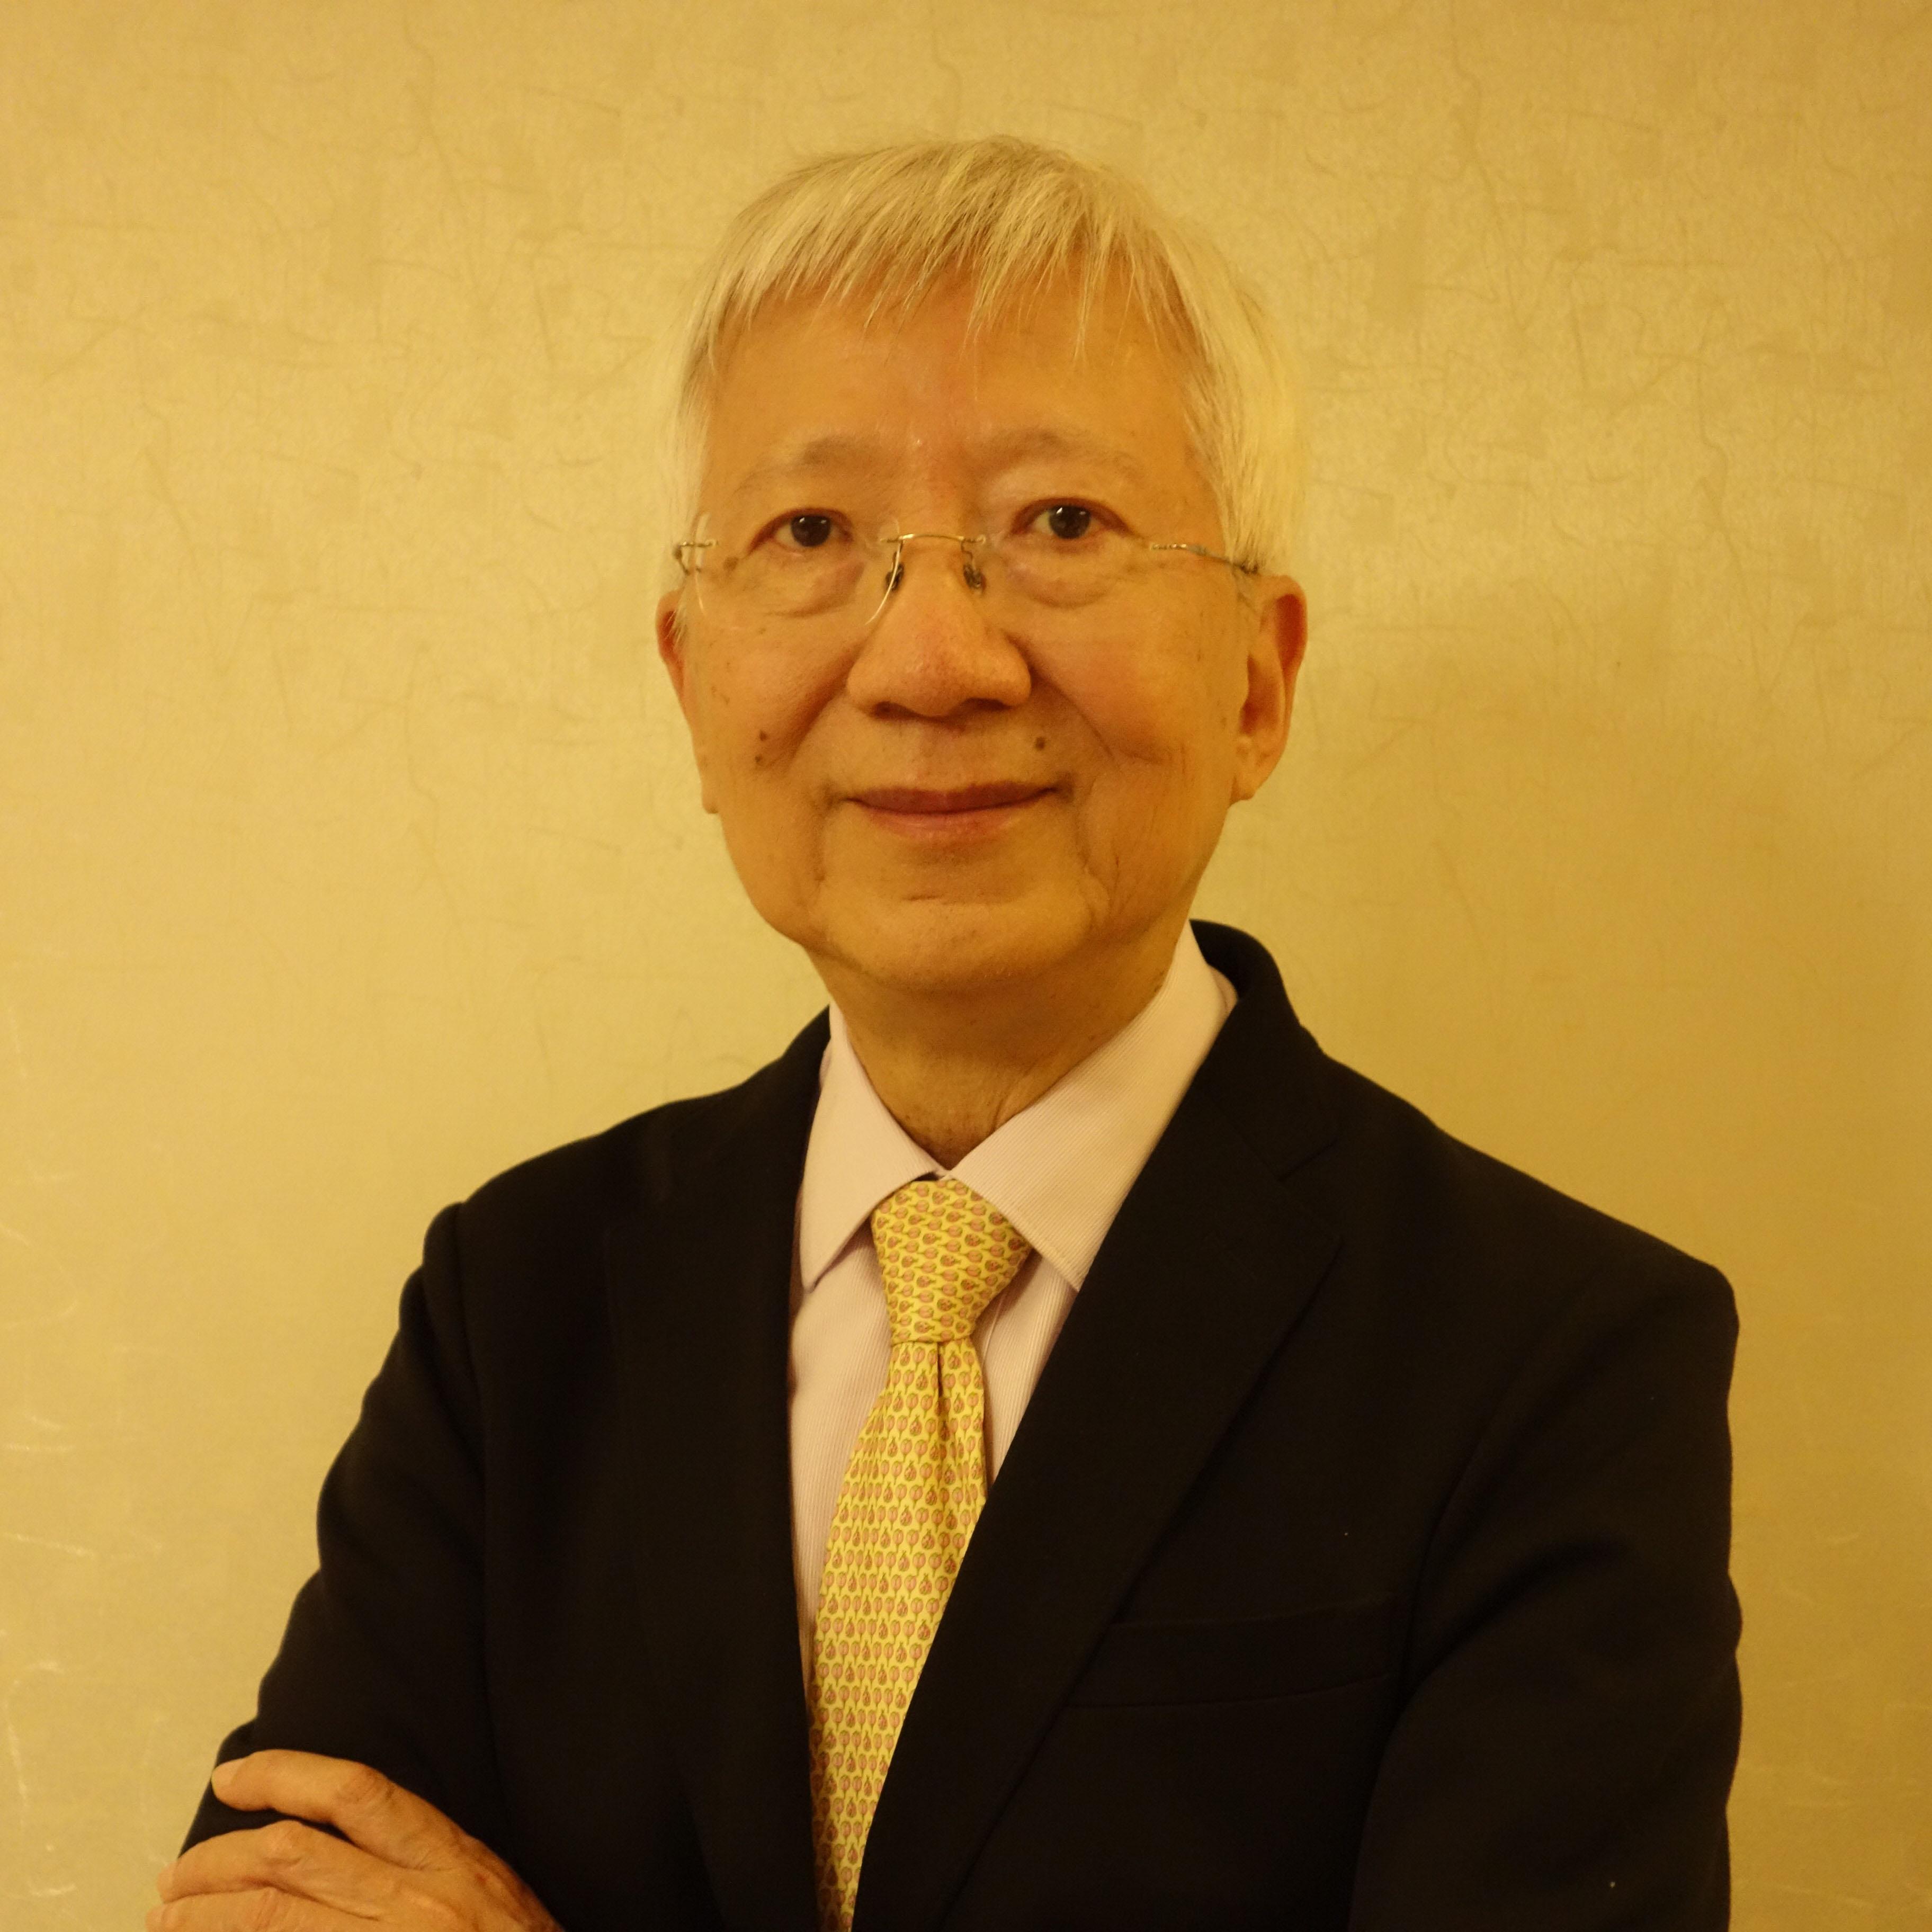 Sung Yun Wing 宋恩榮